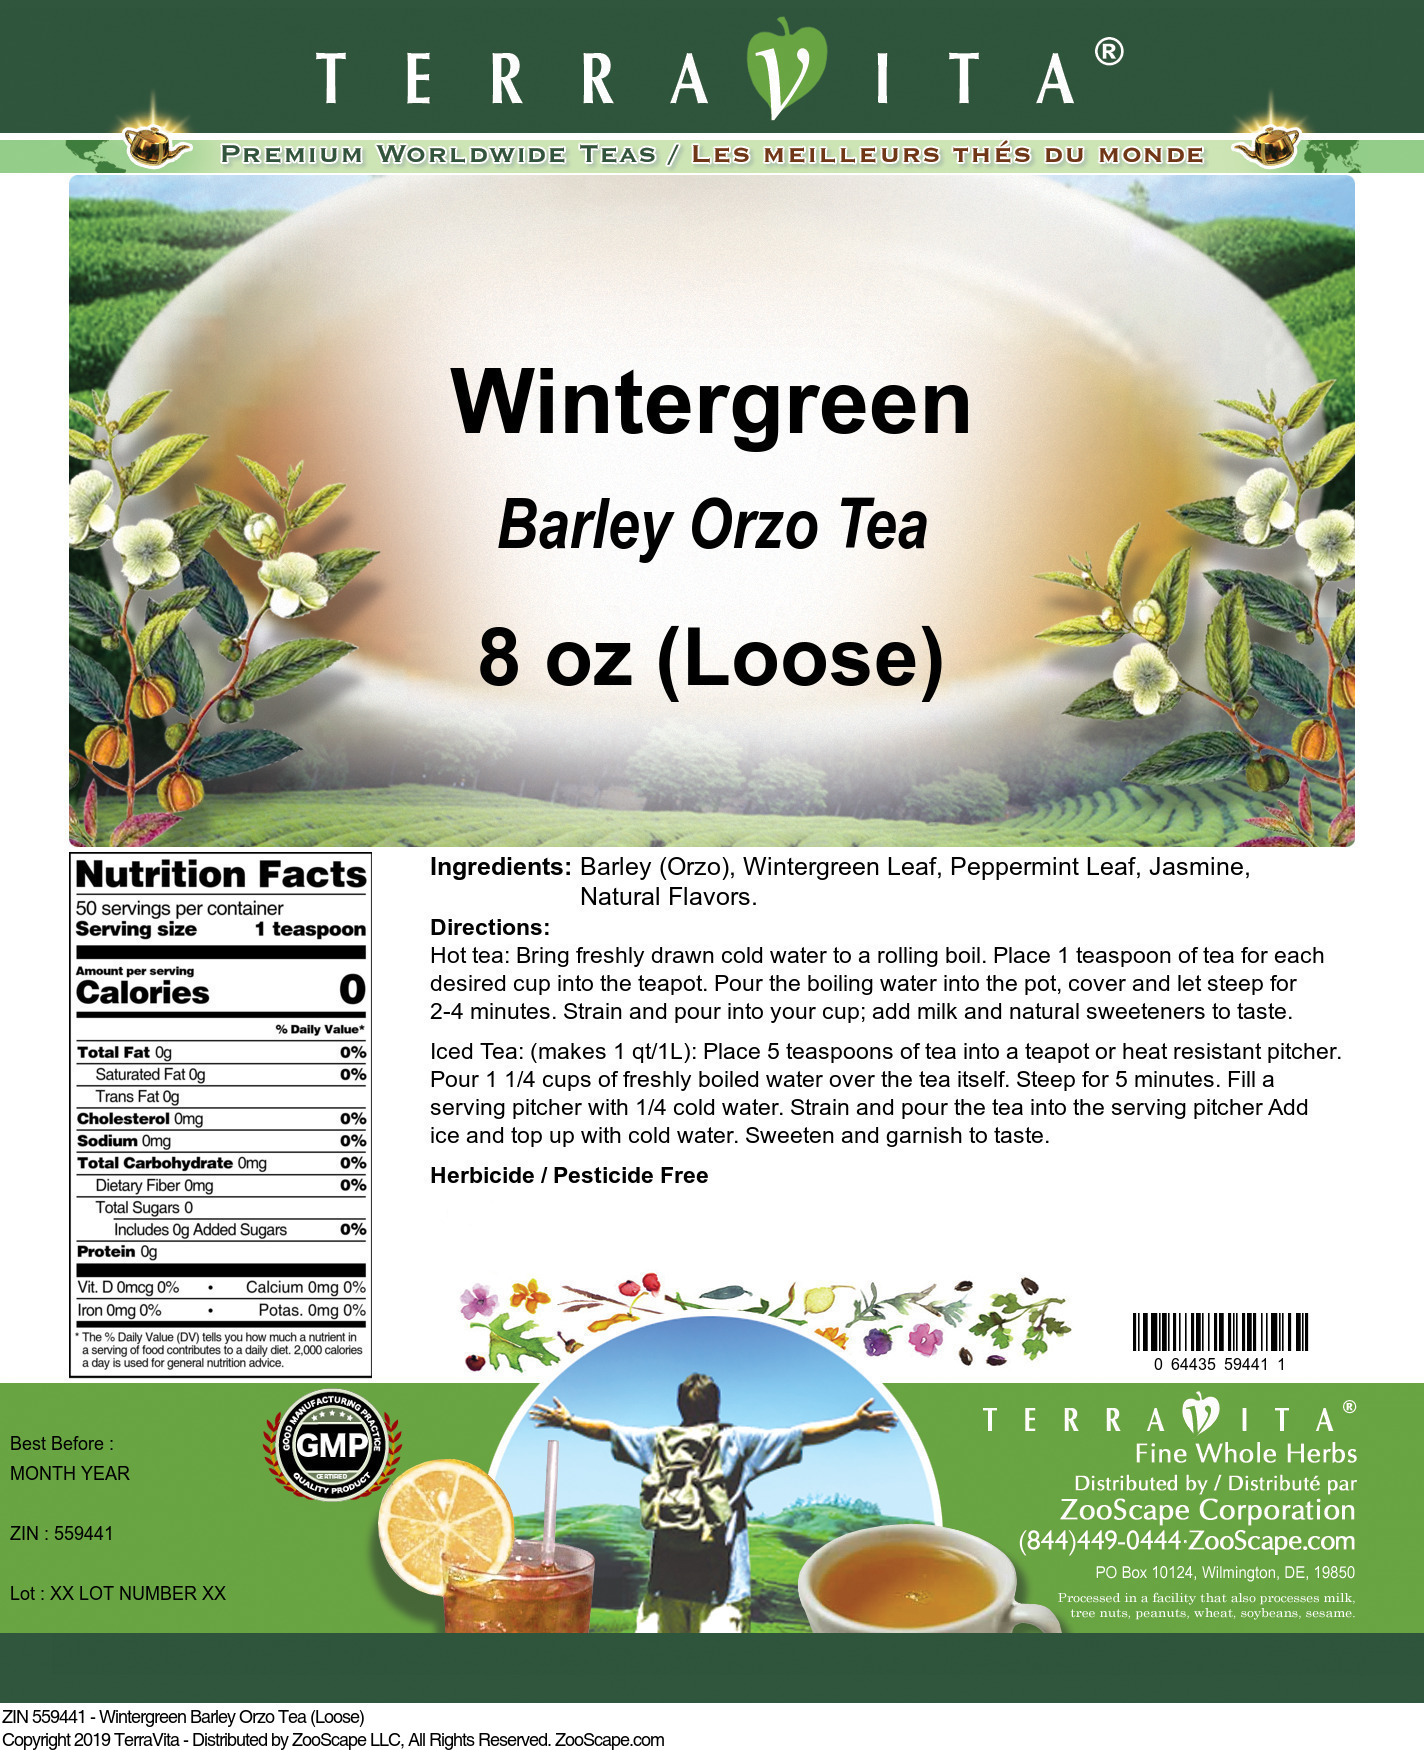 Wintergreen Barley Orzo